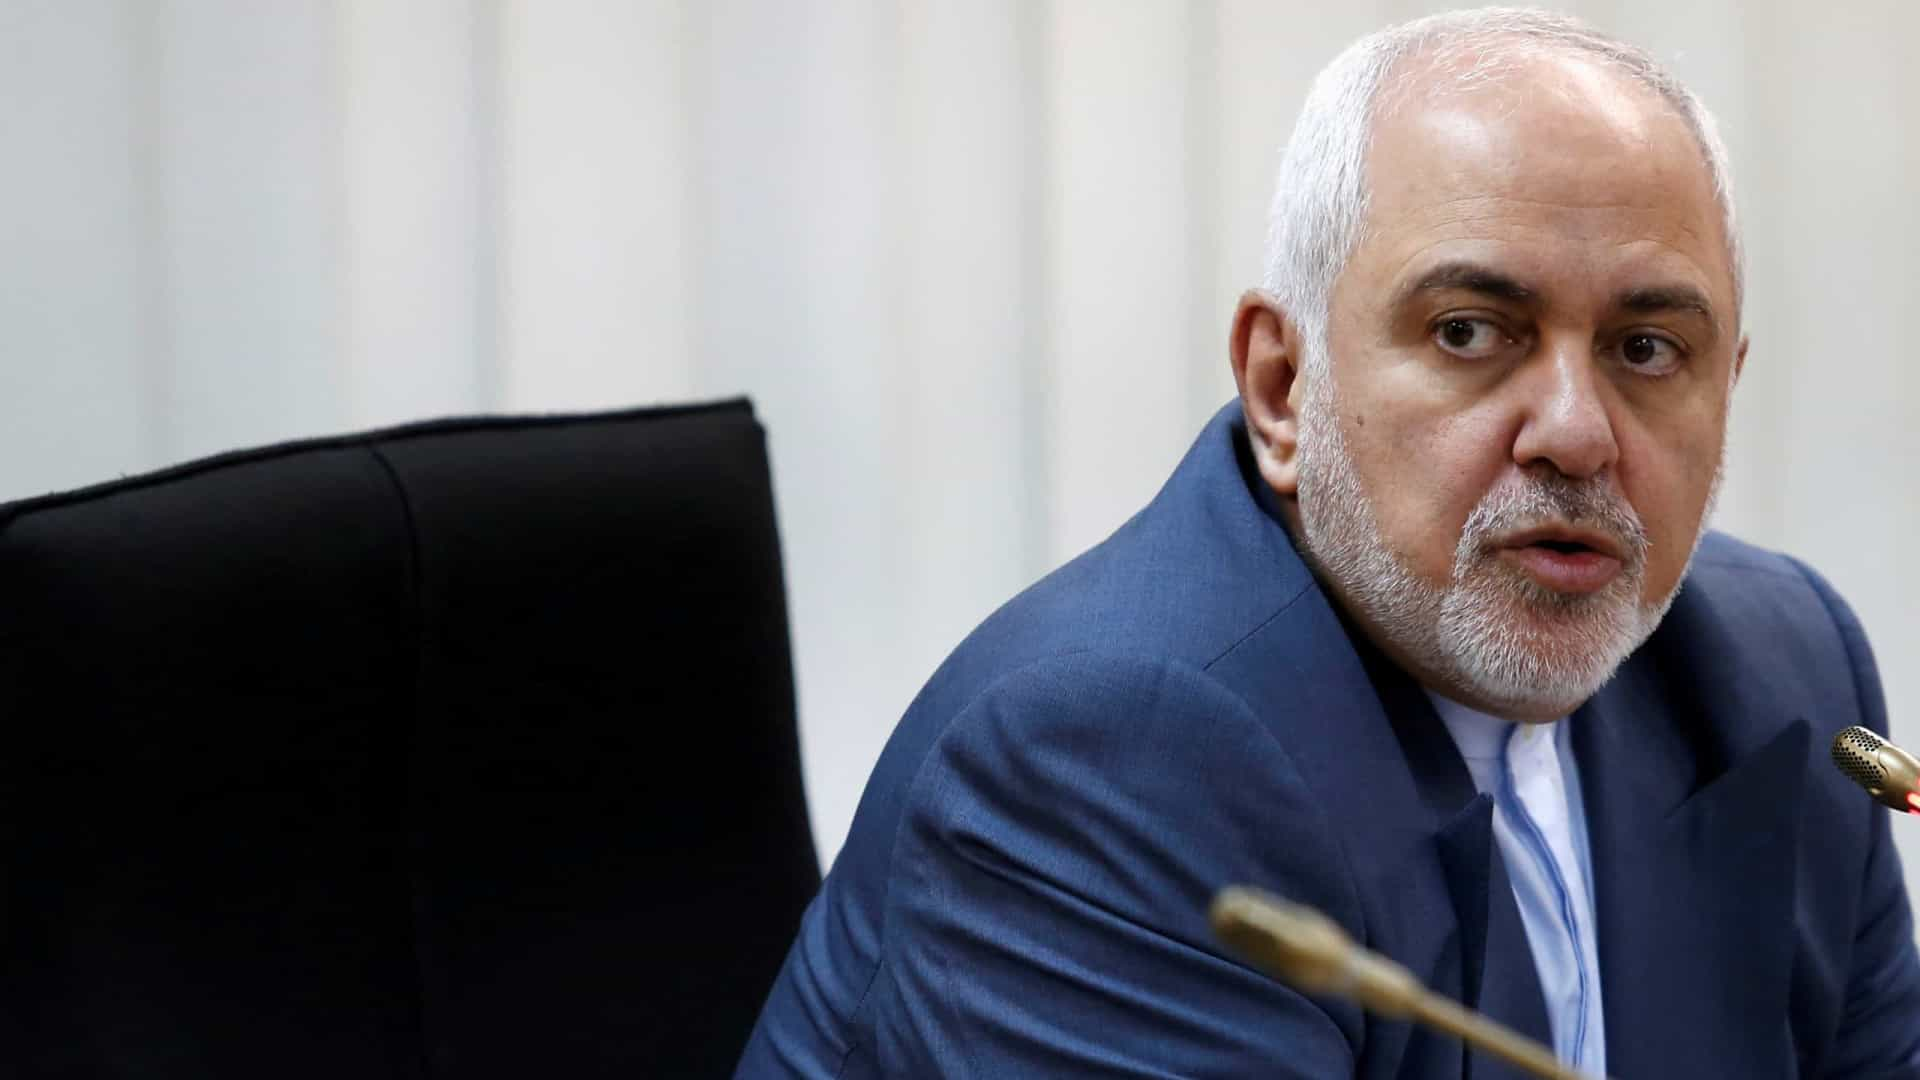 Irão responde a Trump que acordo entre países era pacto nuclear